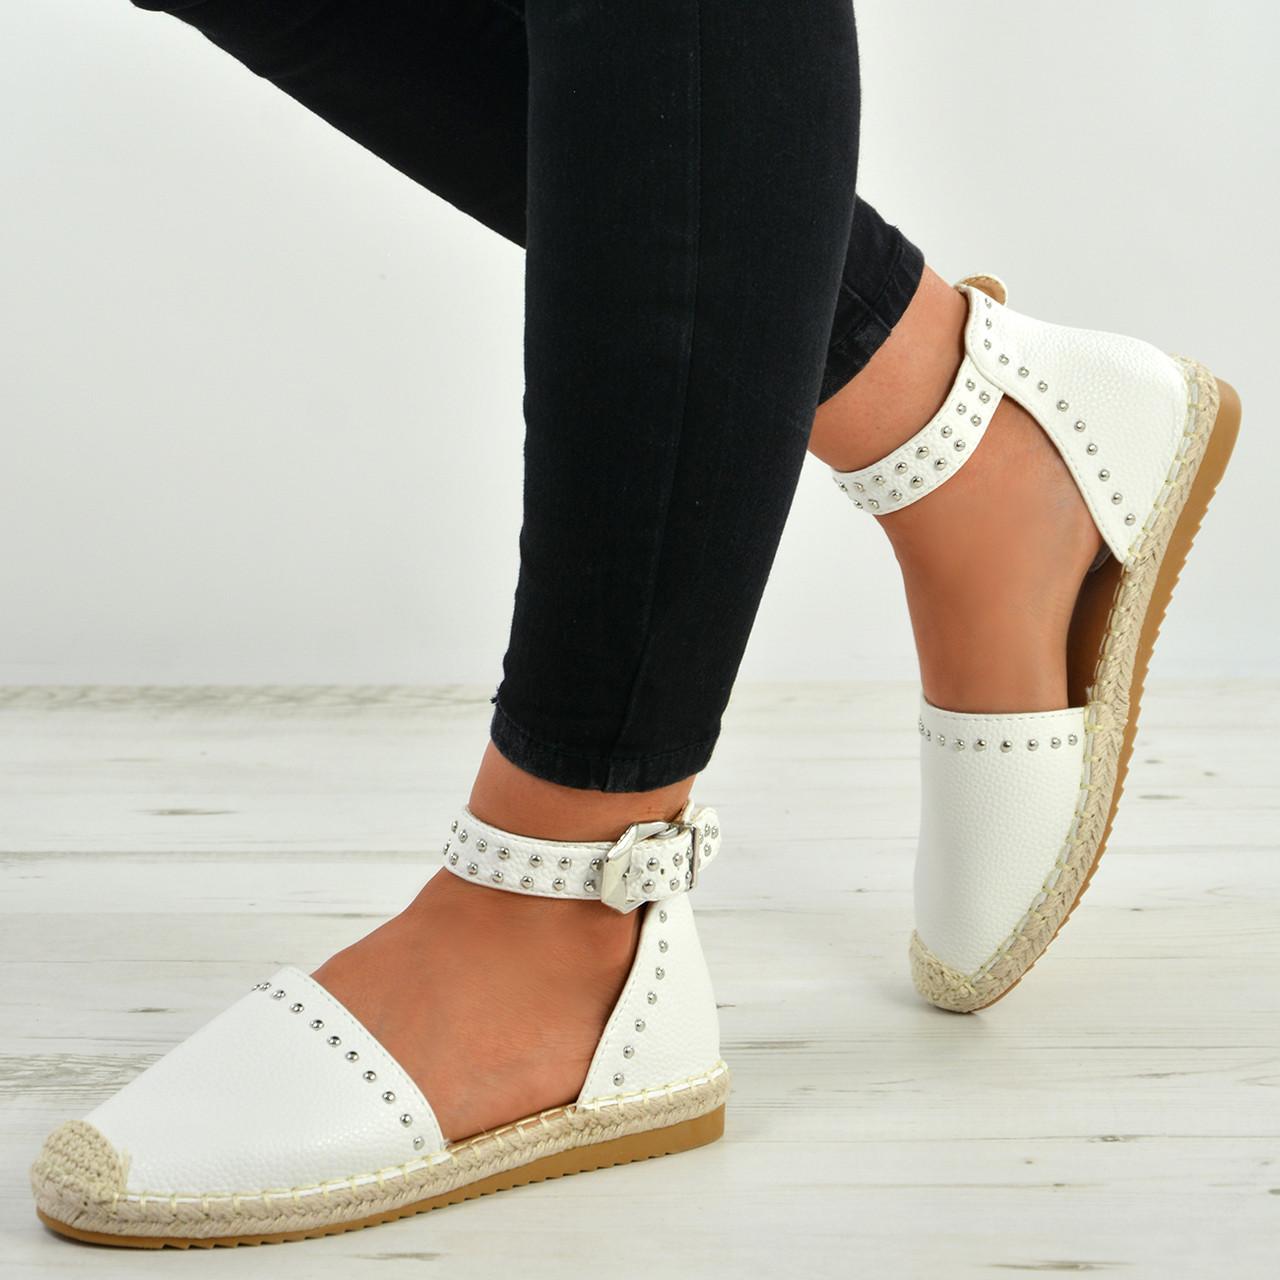 deaaa921586 Stella White Ankle Strap Flat Espadrille